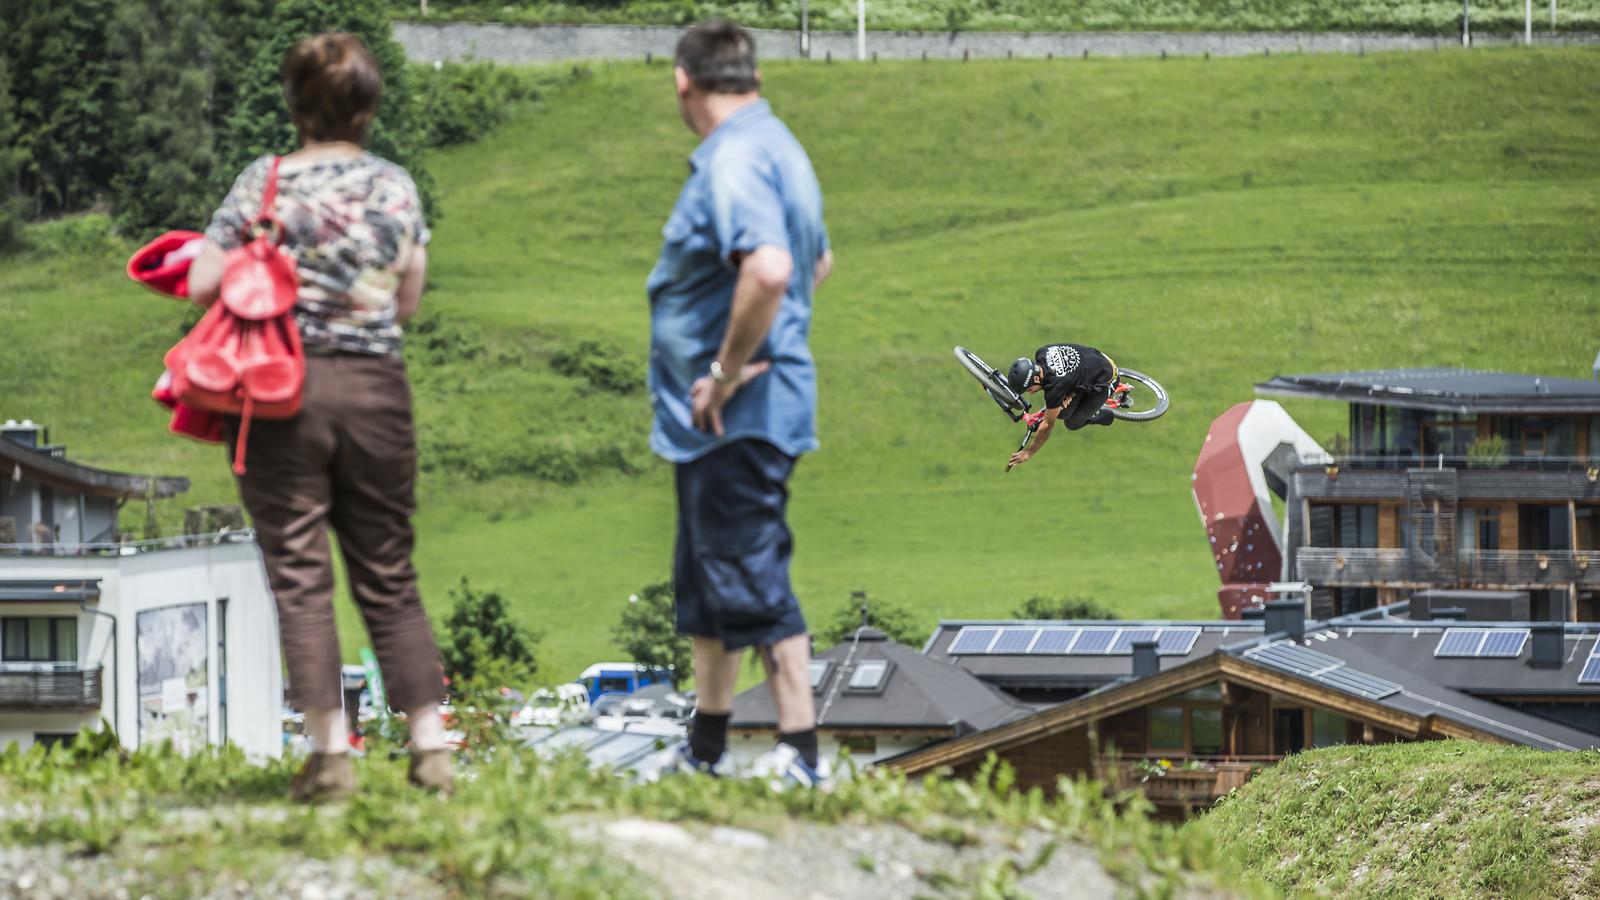 34527315873 515fa765cb o - phunkt.com - Mountain Biking Pictures - Vital MTB